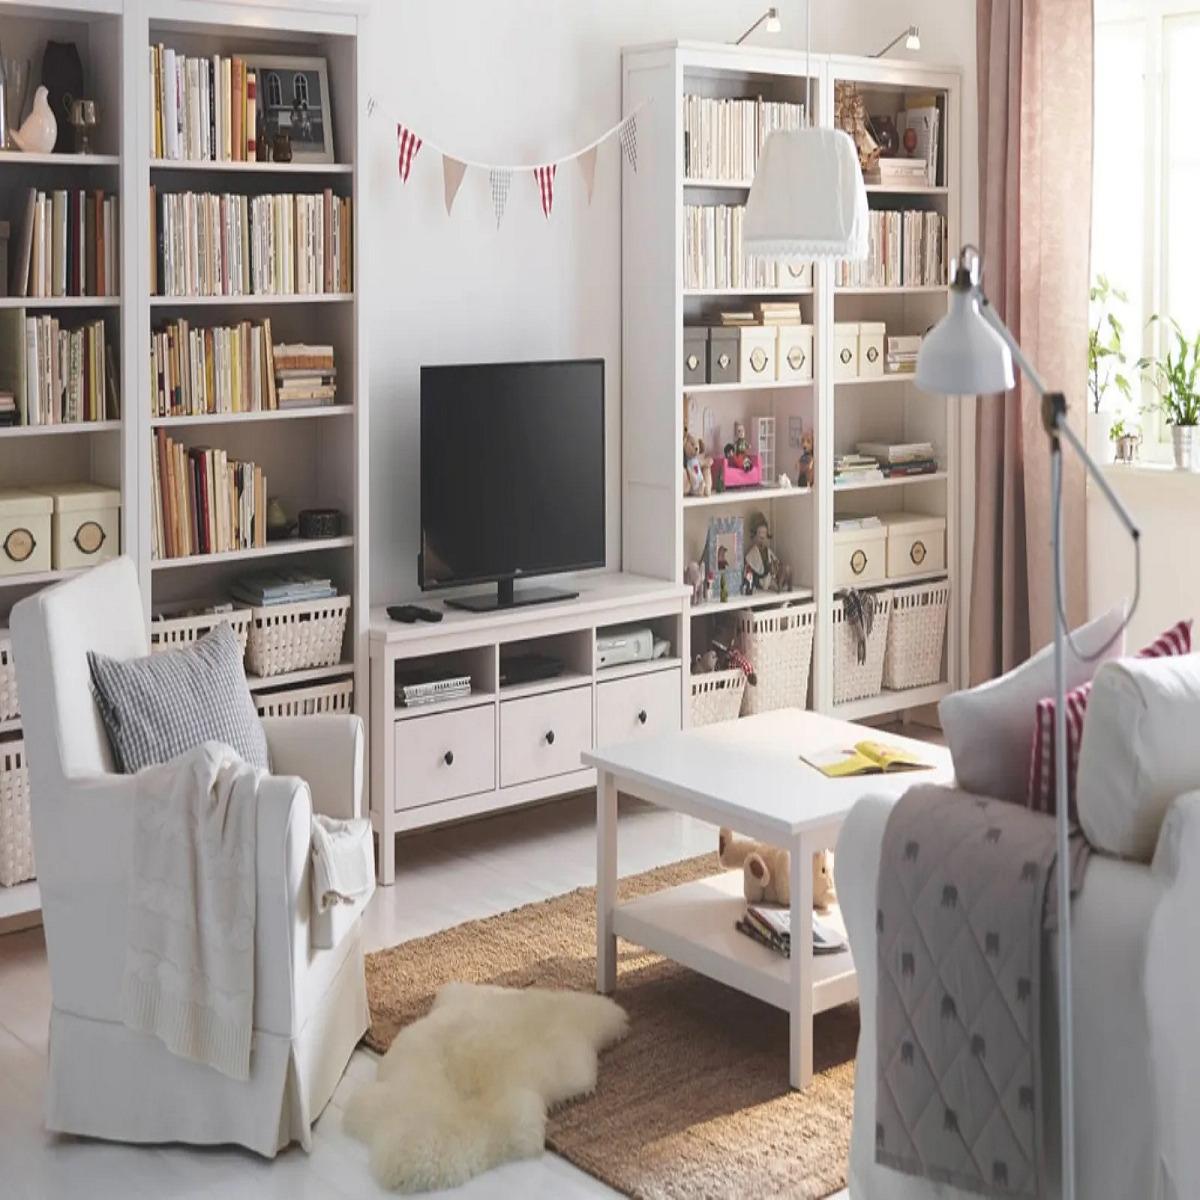 Mobile per sala IKEA: 10 idee e foto